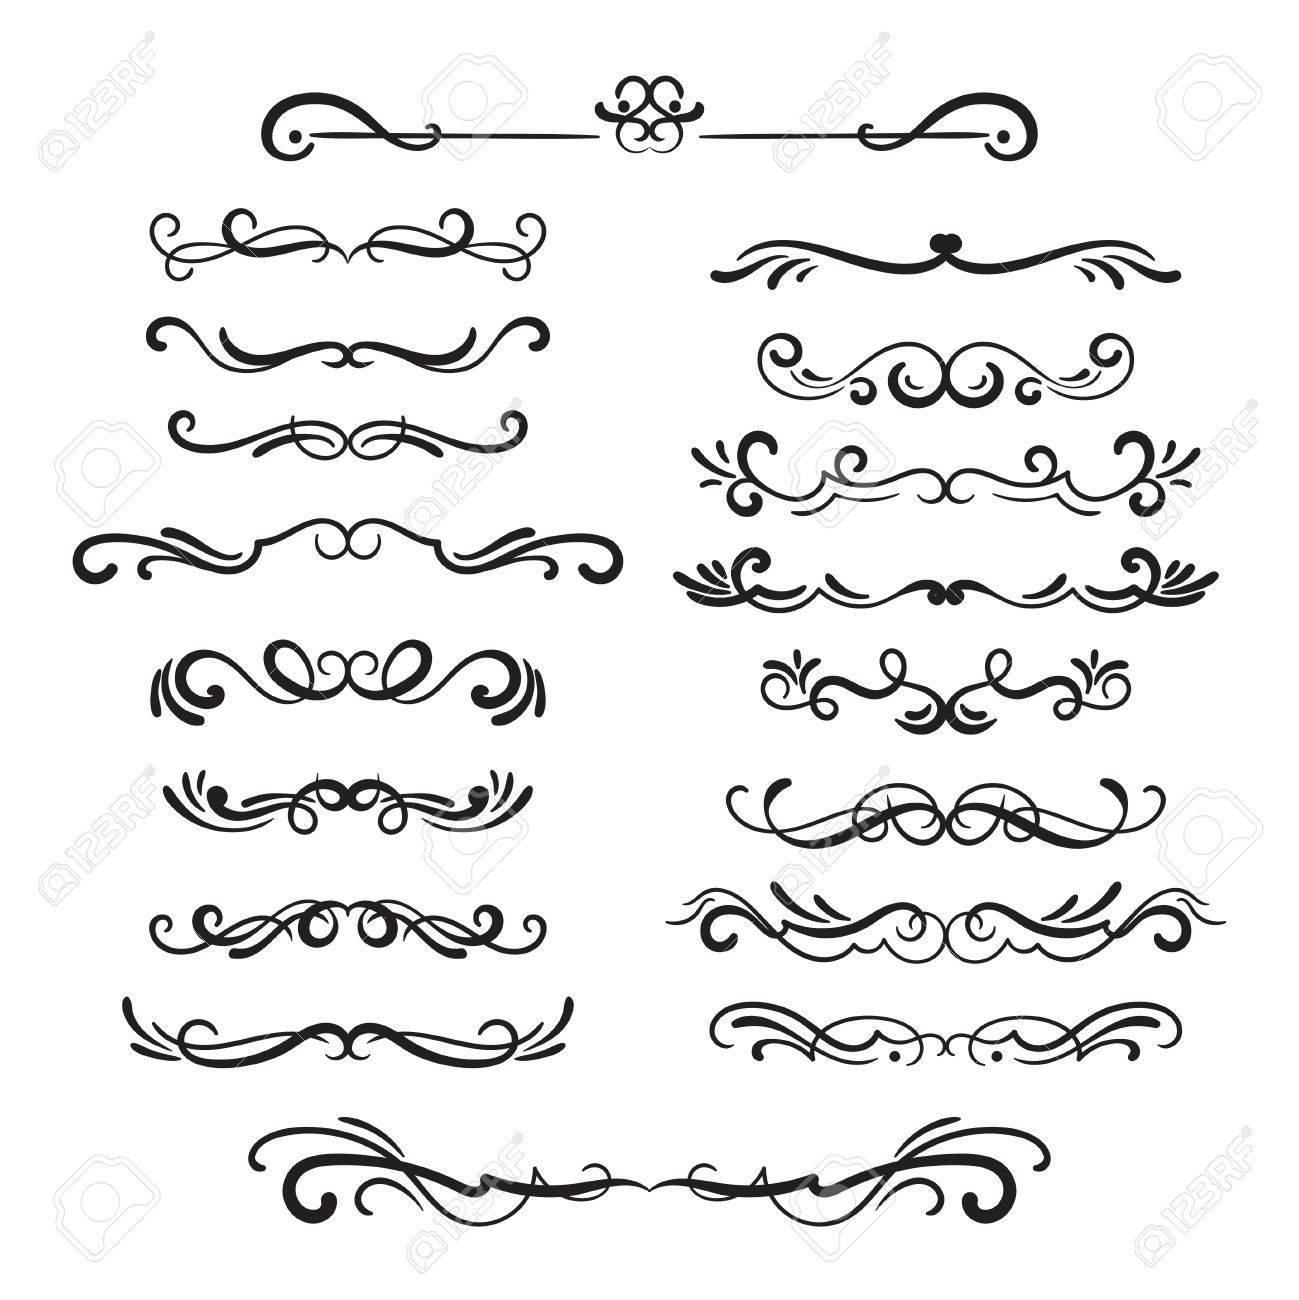 flourishes vintage ornamental borders and dividers filigree rh 123rf com vector flourishes and ornaments vector flourishes and ornaments